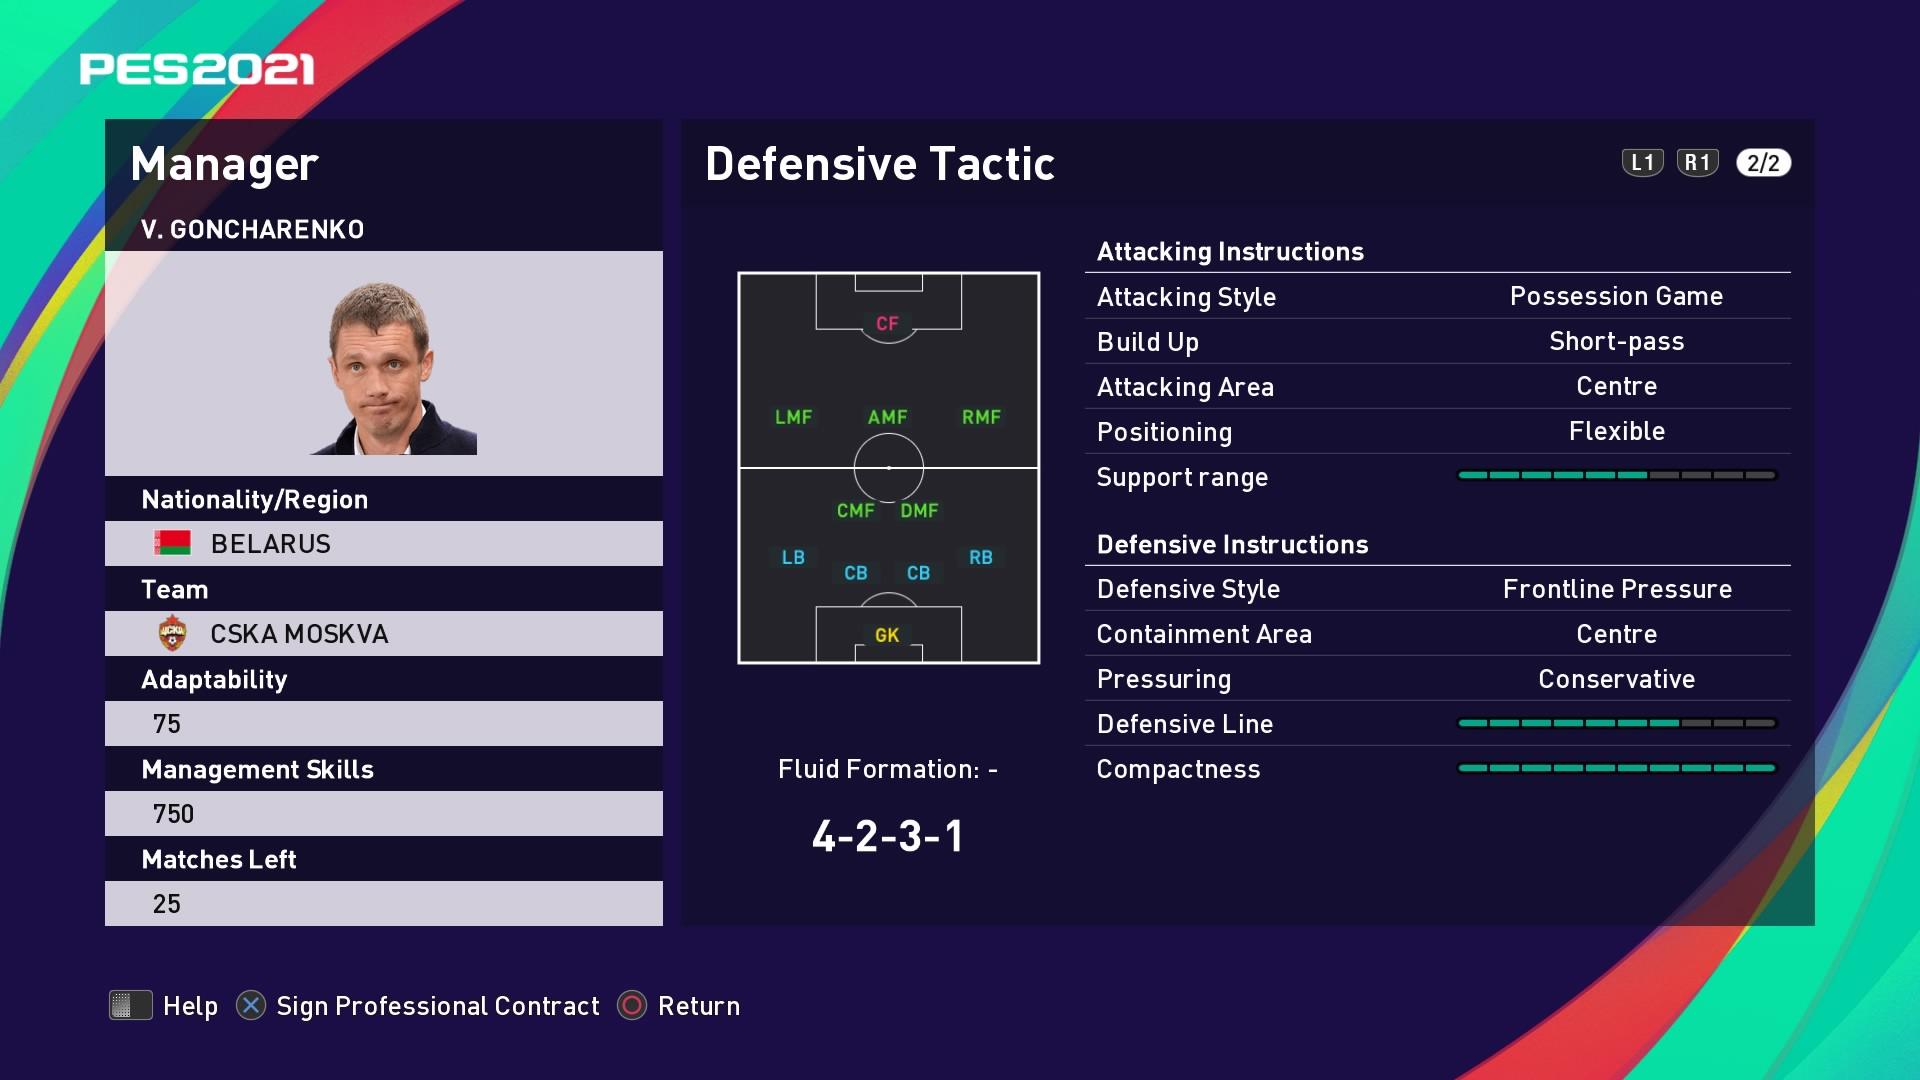 V. Goncharenko (Viktor Goncharenko) Defensive Tactic in PES 2021 myClub